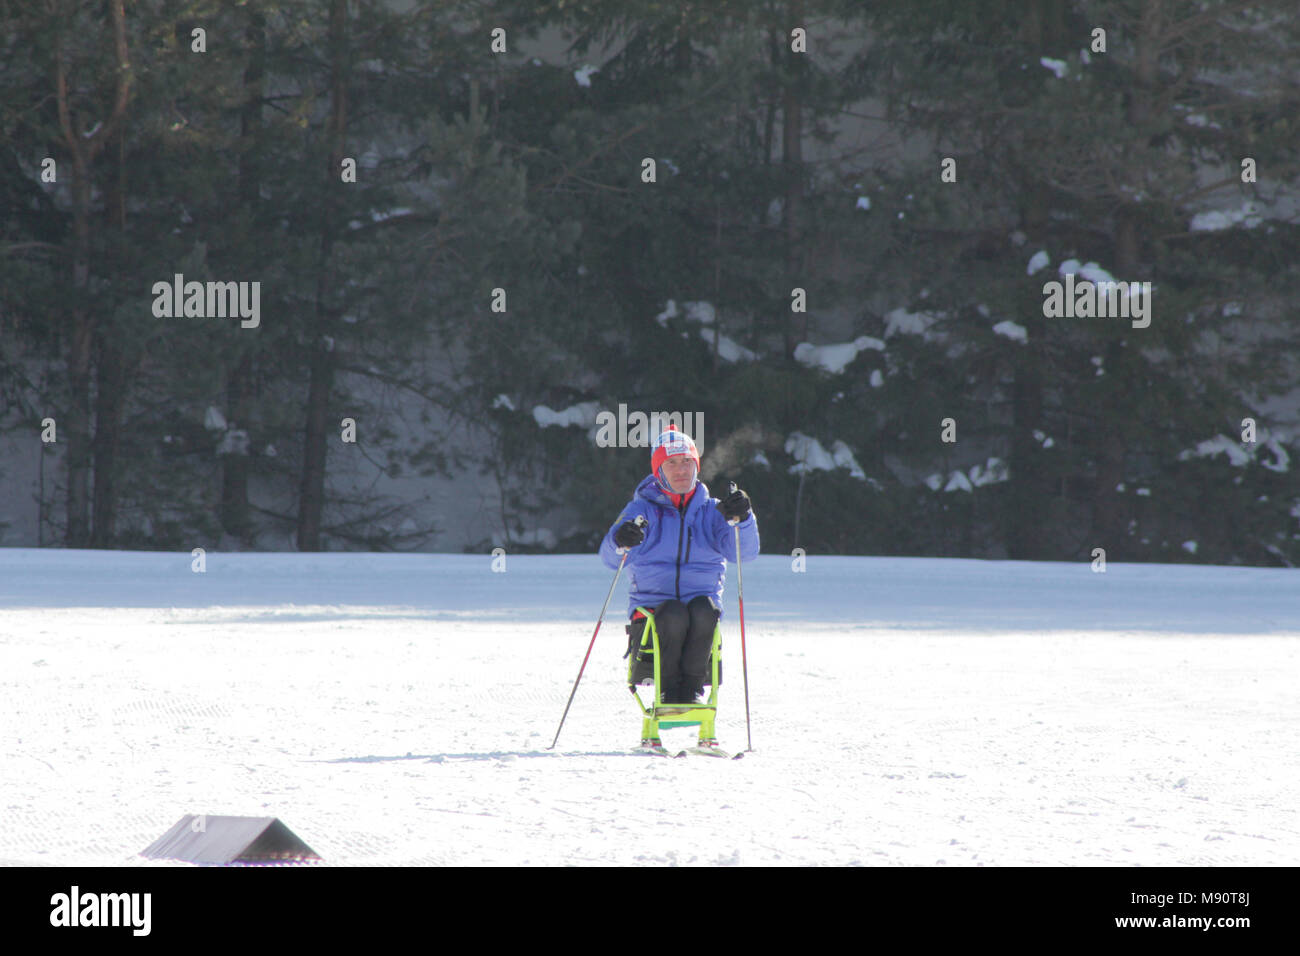 KAZAN, RUSSIA - MARCH, 2018: Disabled skier participant on ski-track on ski marathon - Stock Image